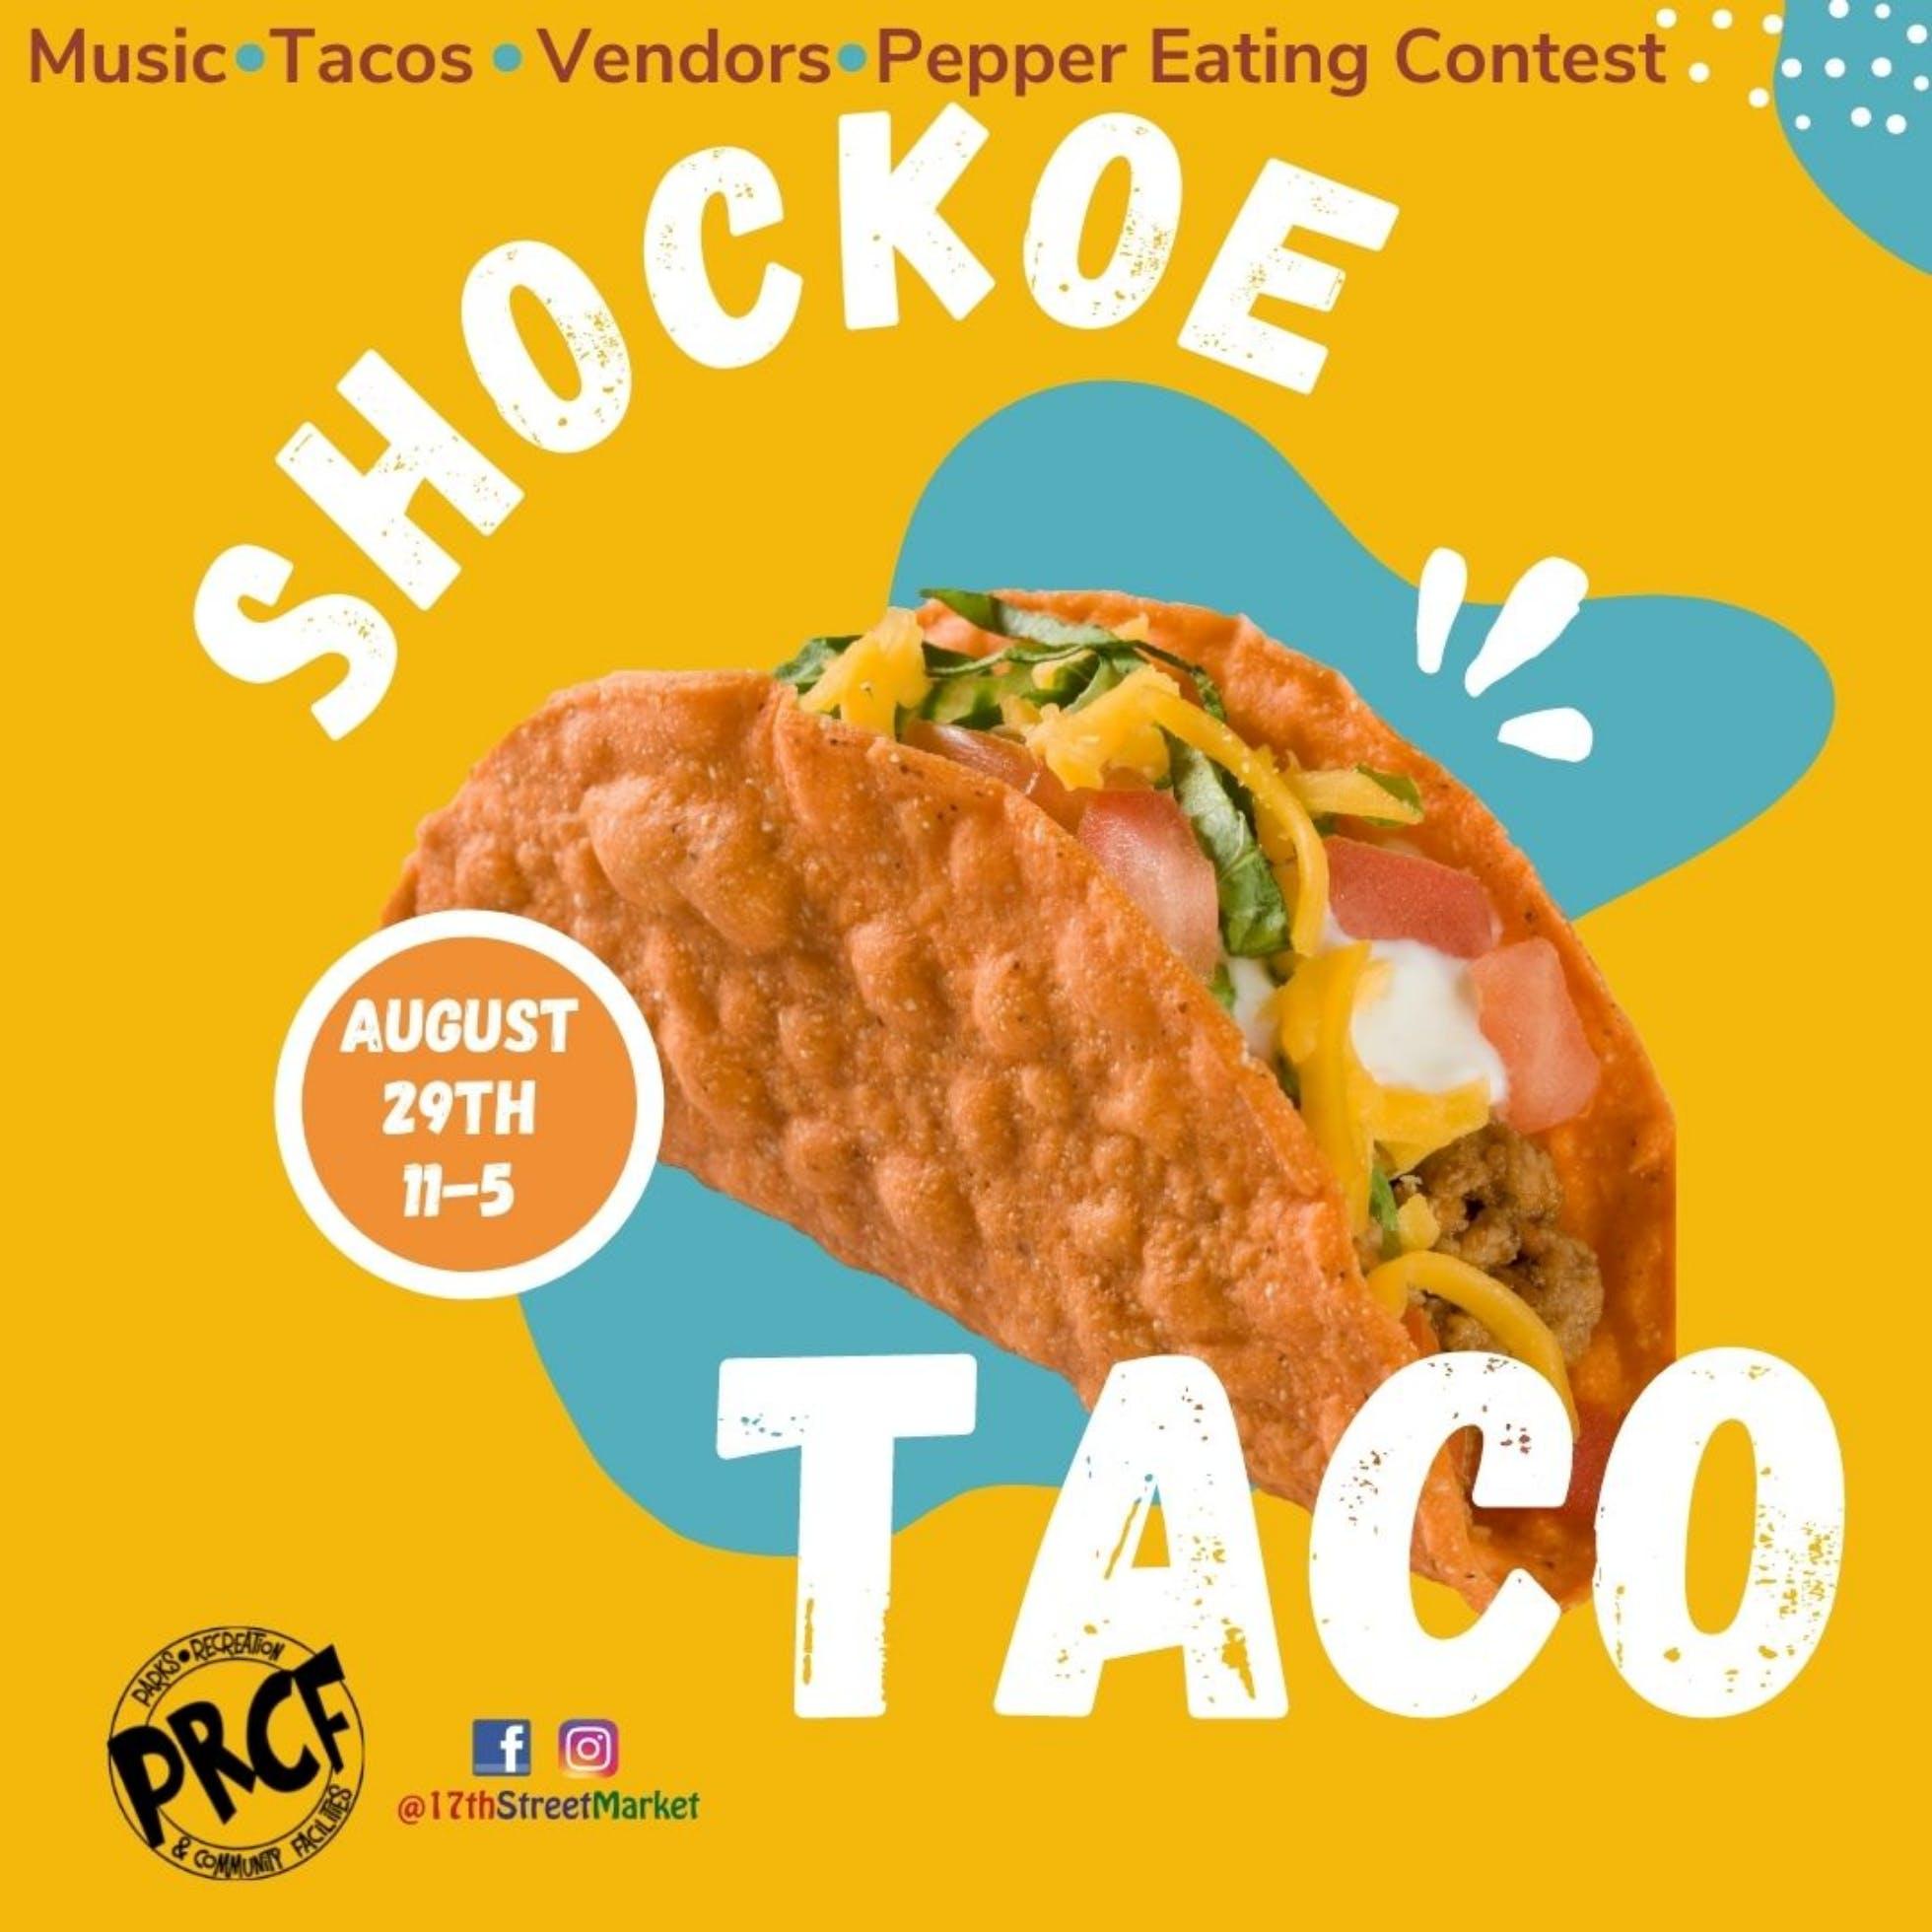 Shockoe Taco